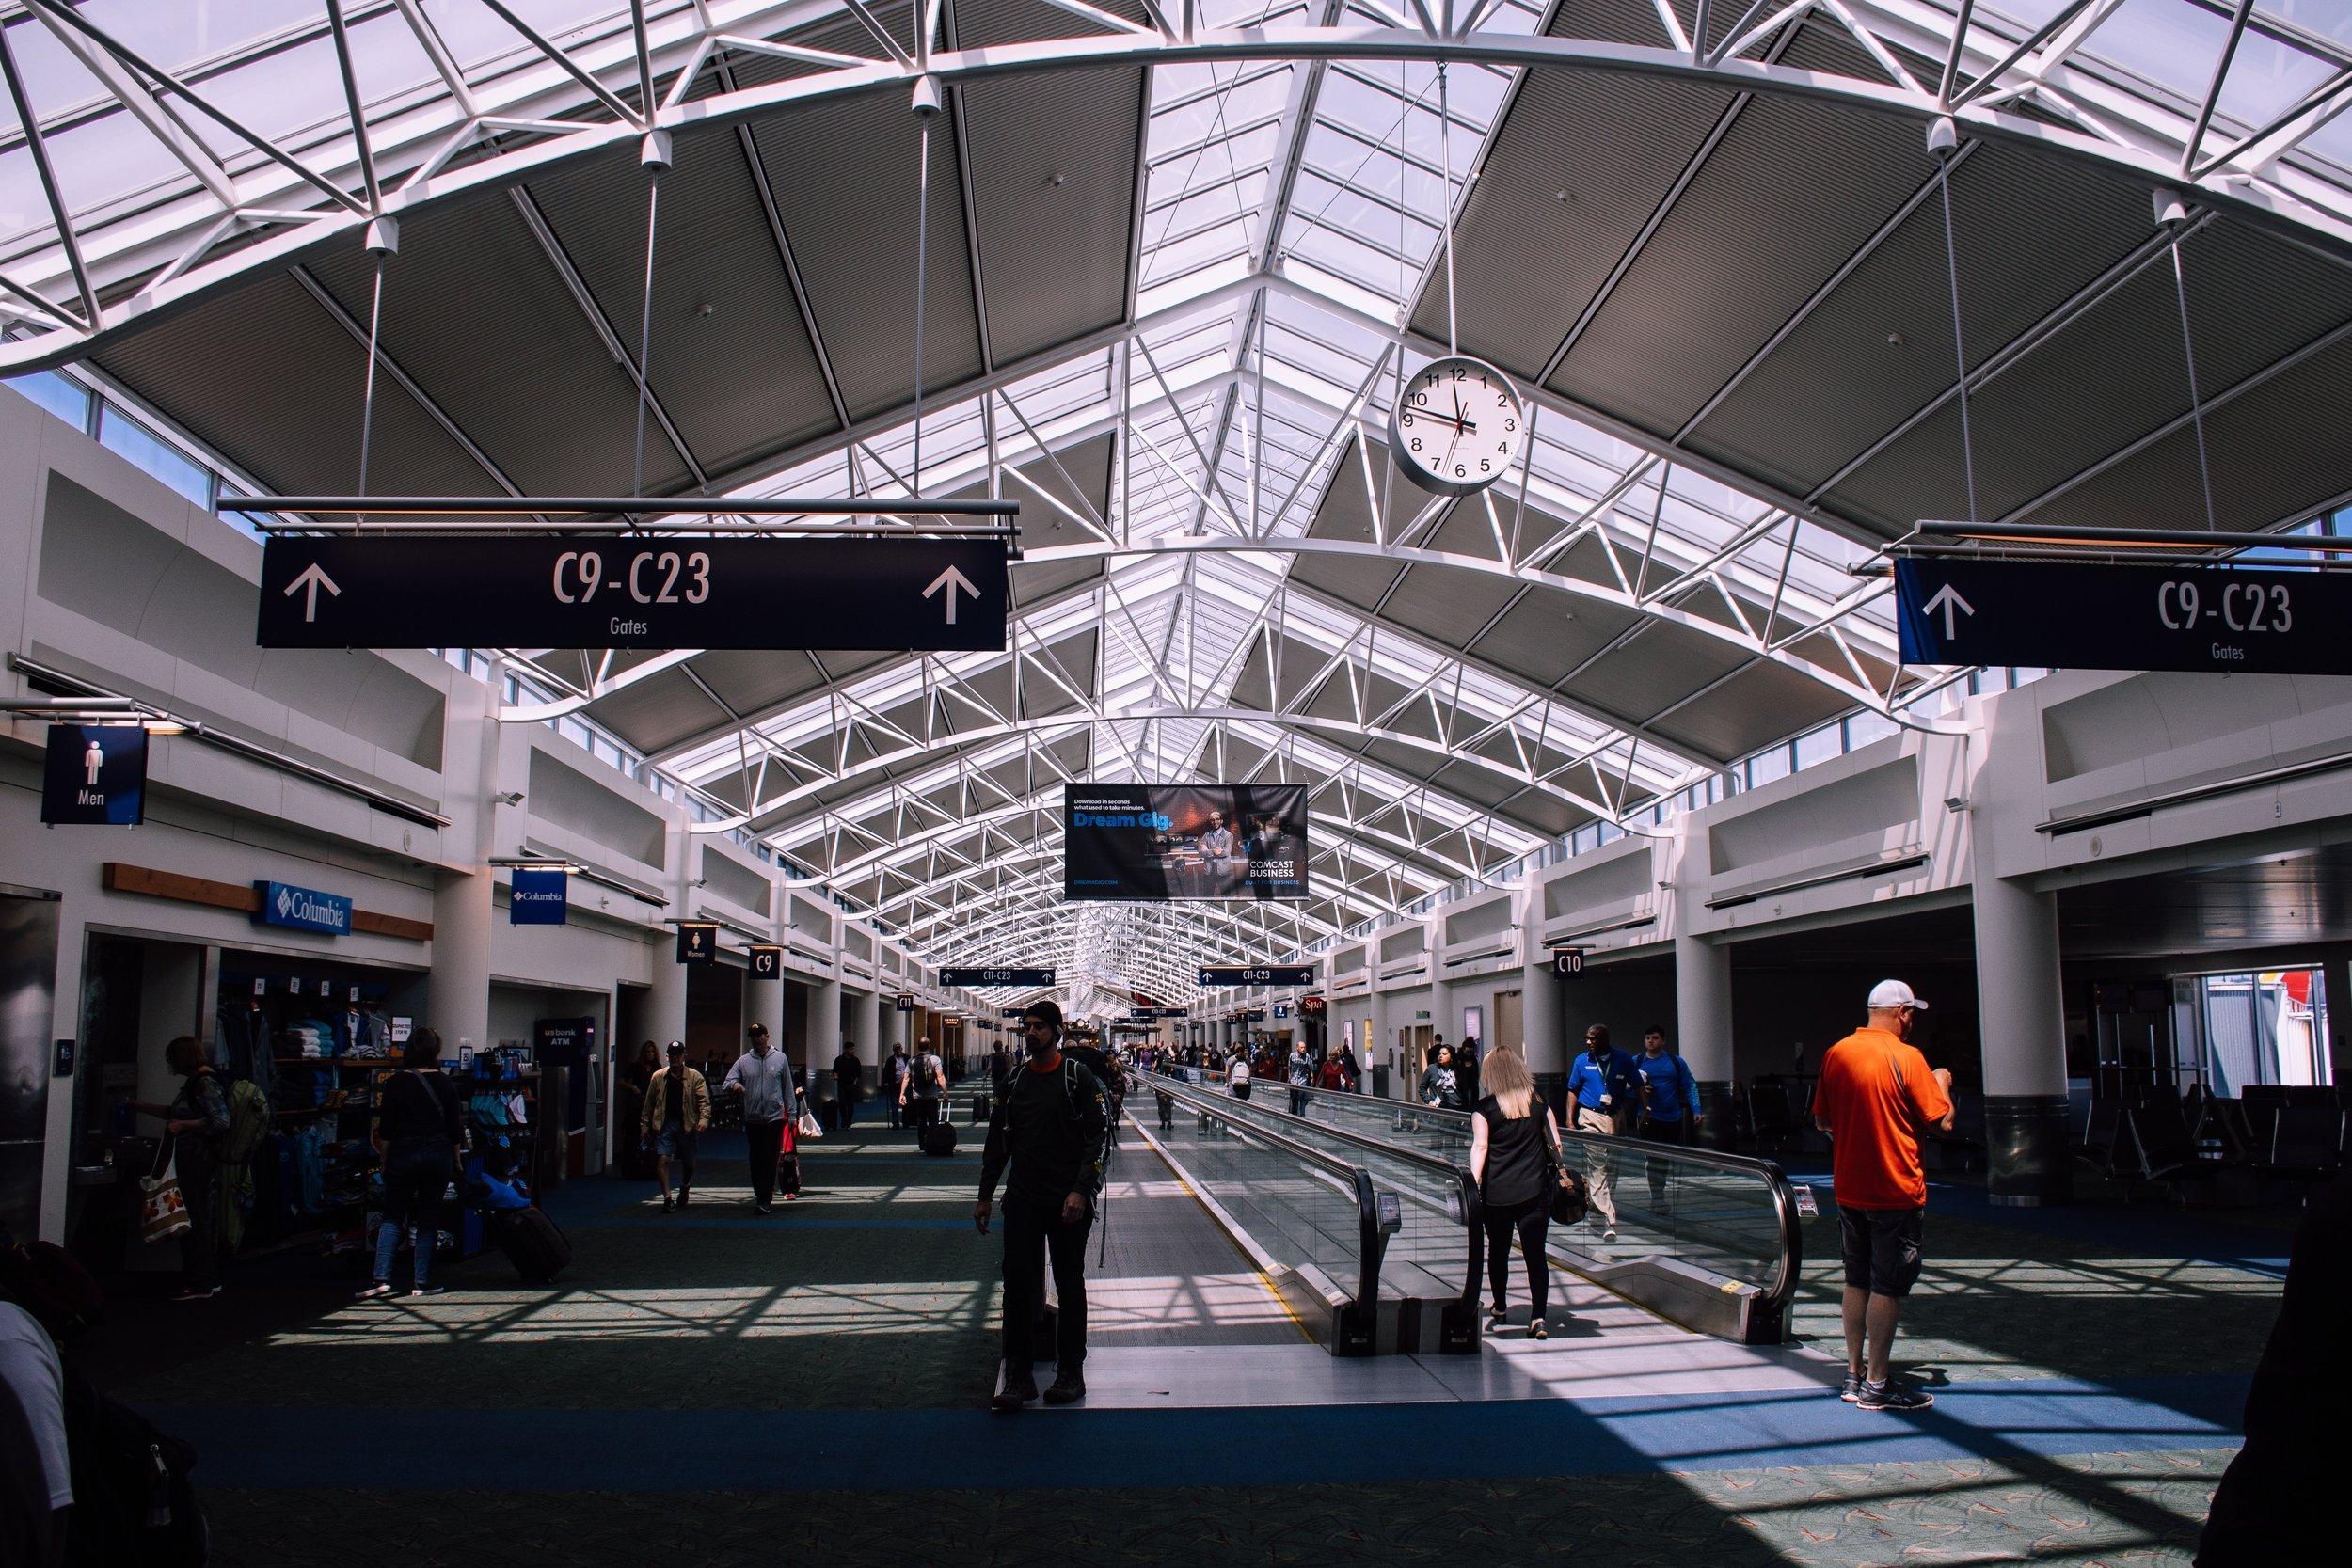 airport-arrival-building-1115358.jpg